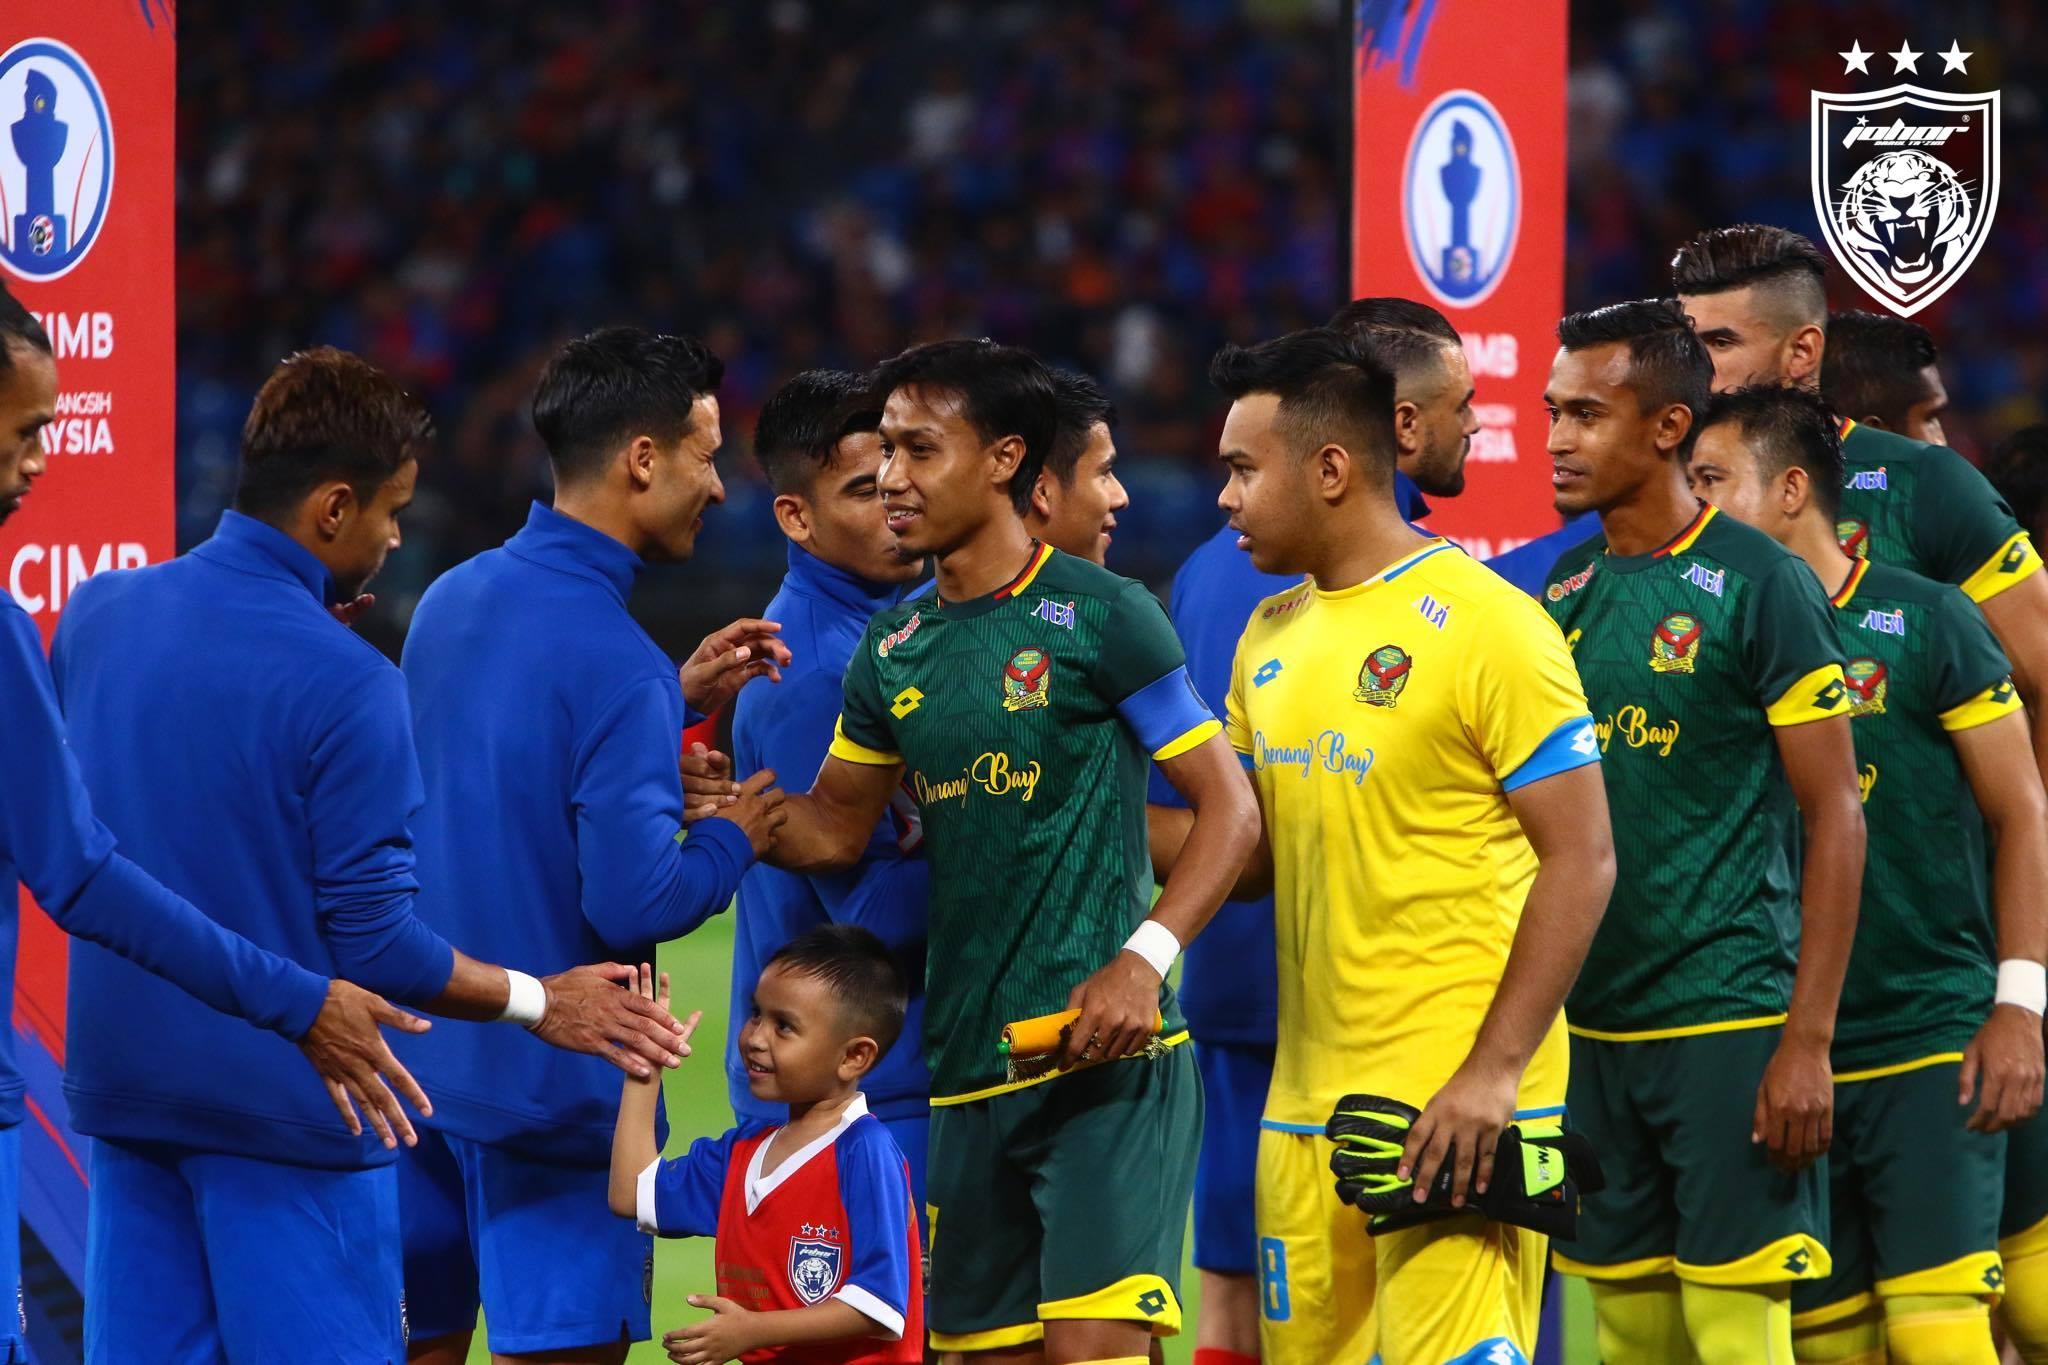 JDT Kedah Piala Sumbangsih Liga Super 2020 2021